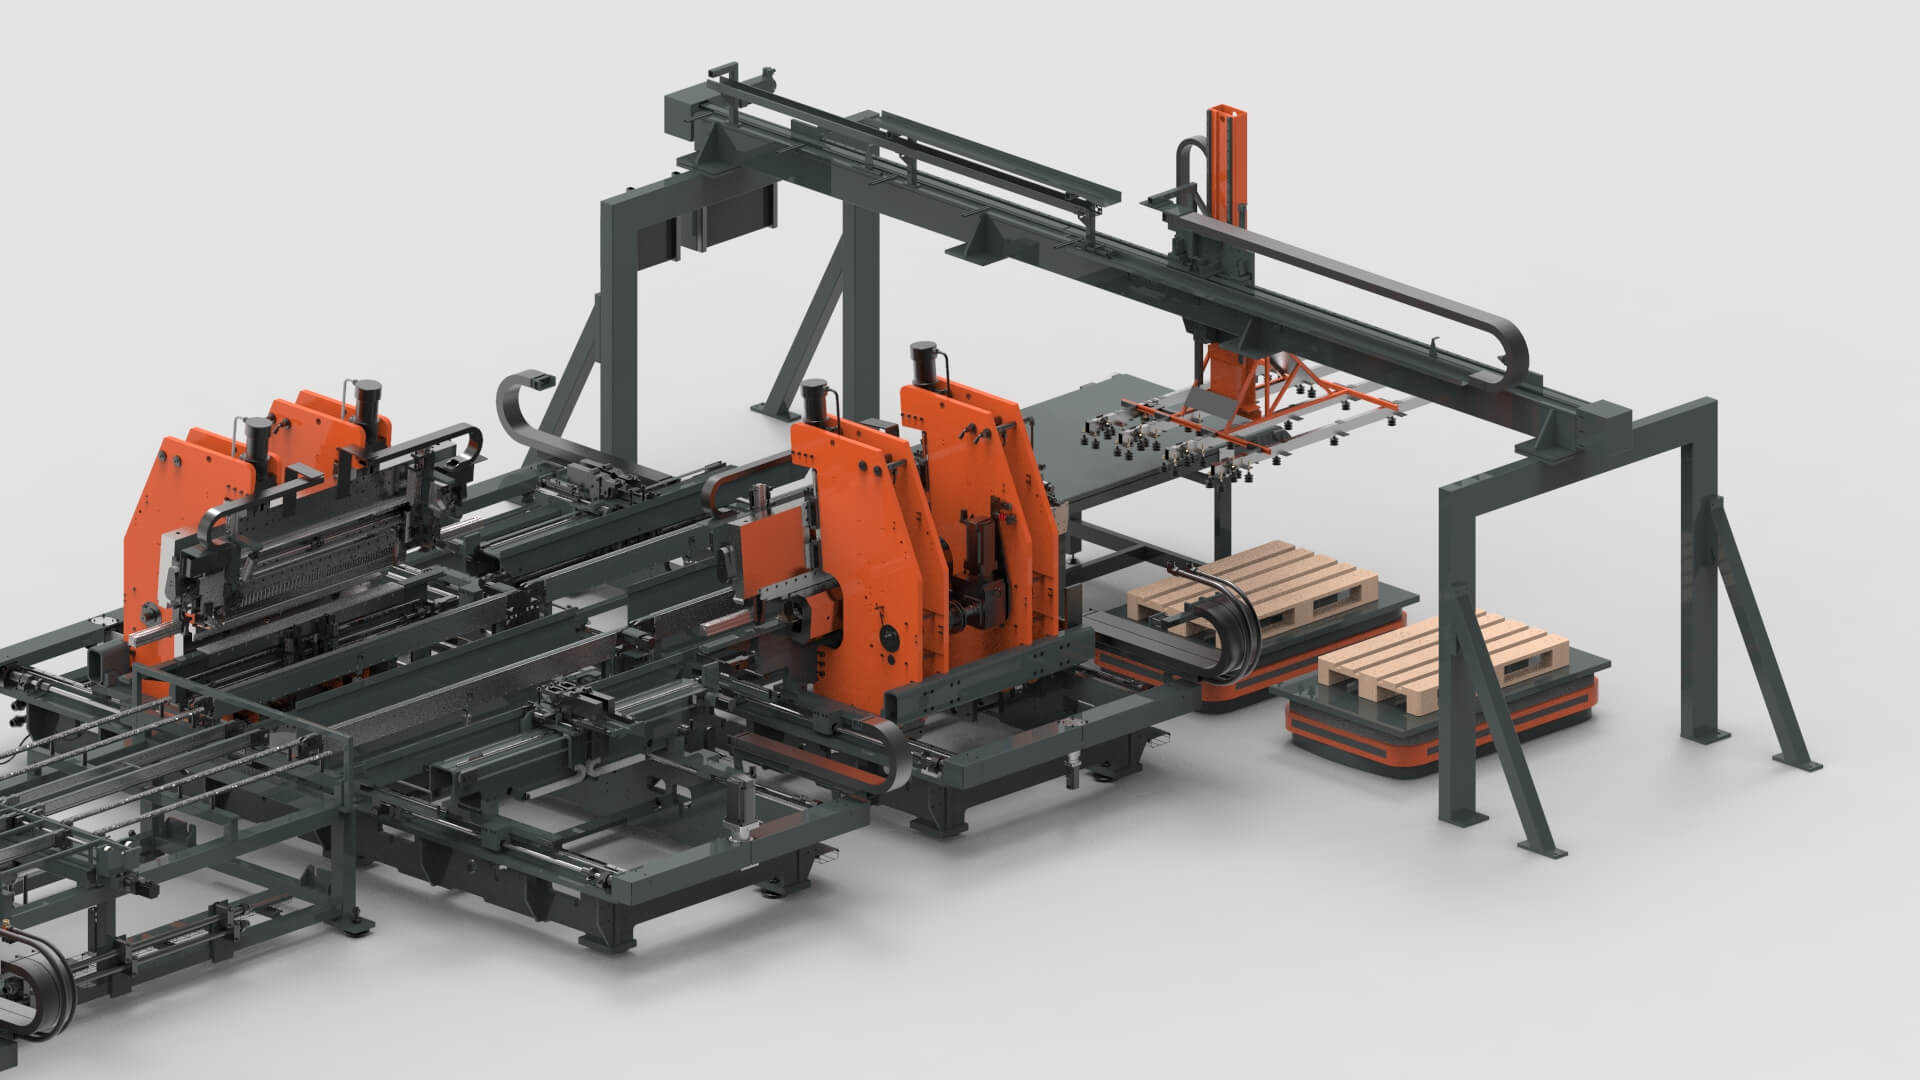 wemo-steel-cabinets-sheet-metal-bending-production-line-automated-unloading-station.jpg